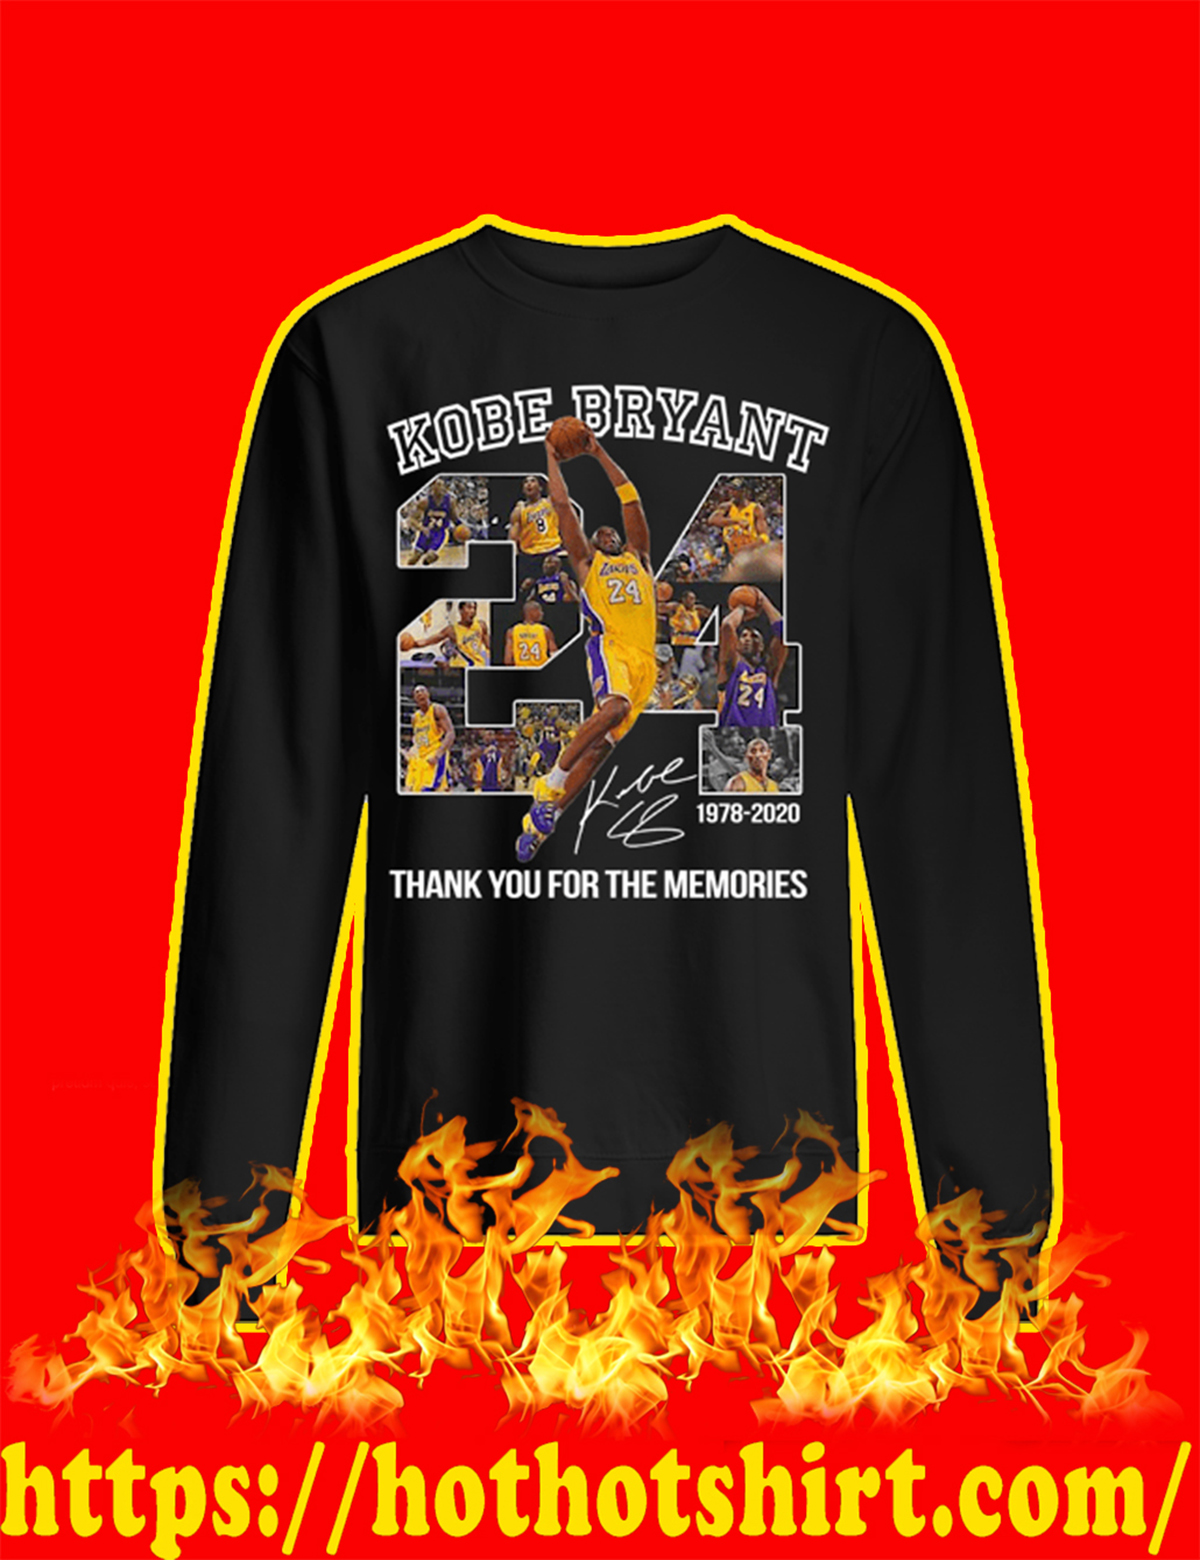 Kobe Bryant Thank You For The Memories sweatshirt